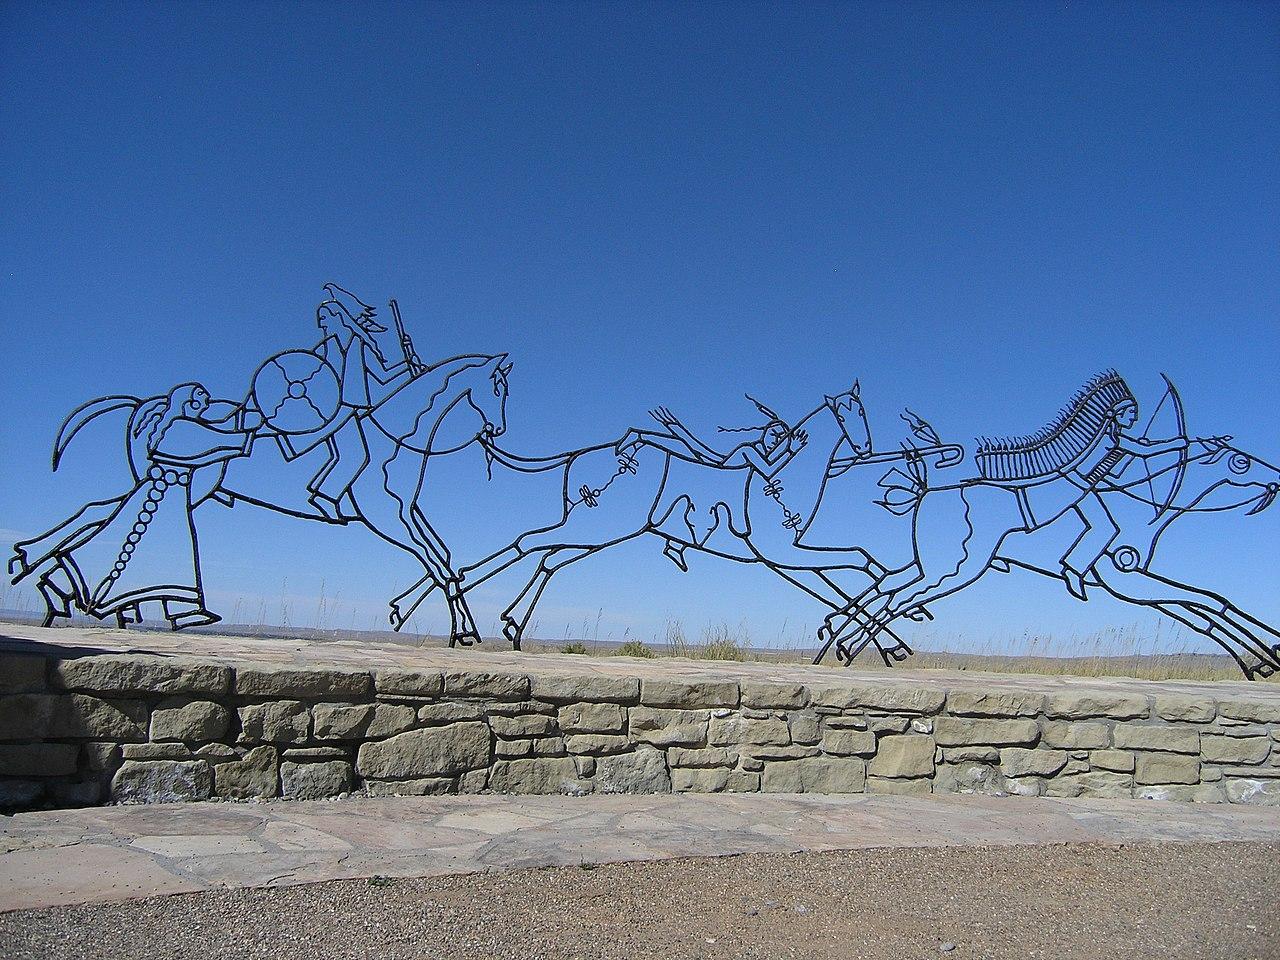 battle of little bighorn summary